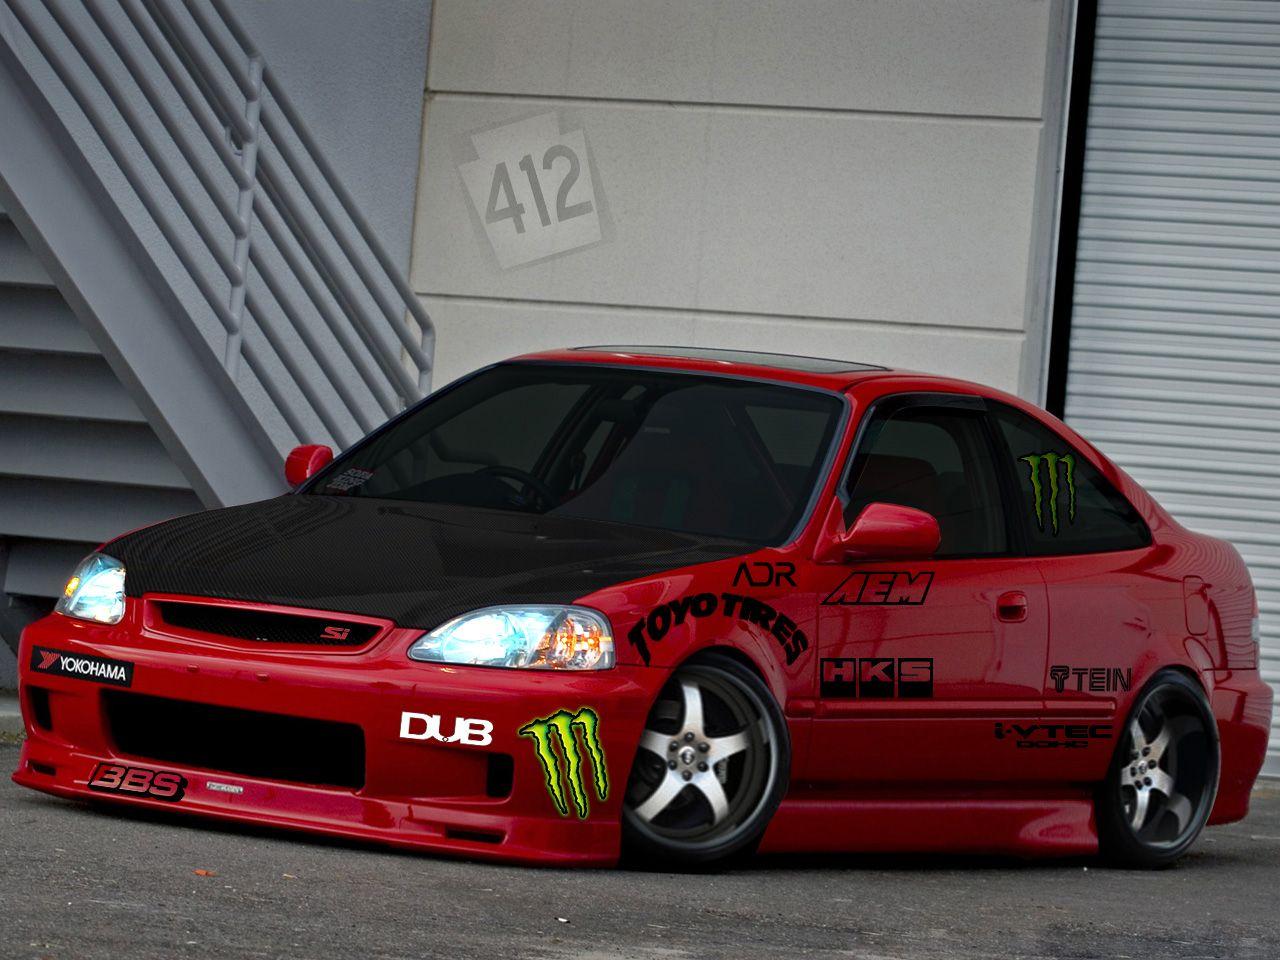 Honda Civic 2000 Modified HD Wallpaper http//wallucky